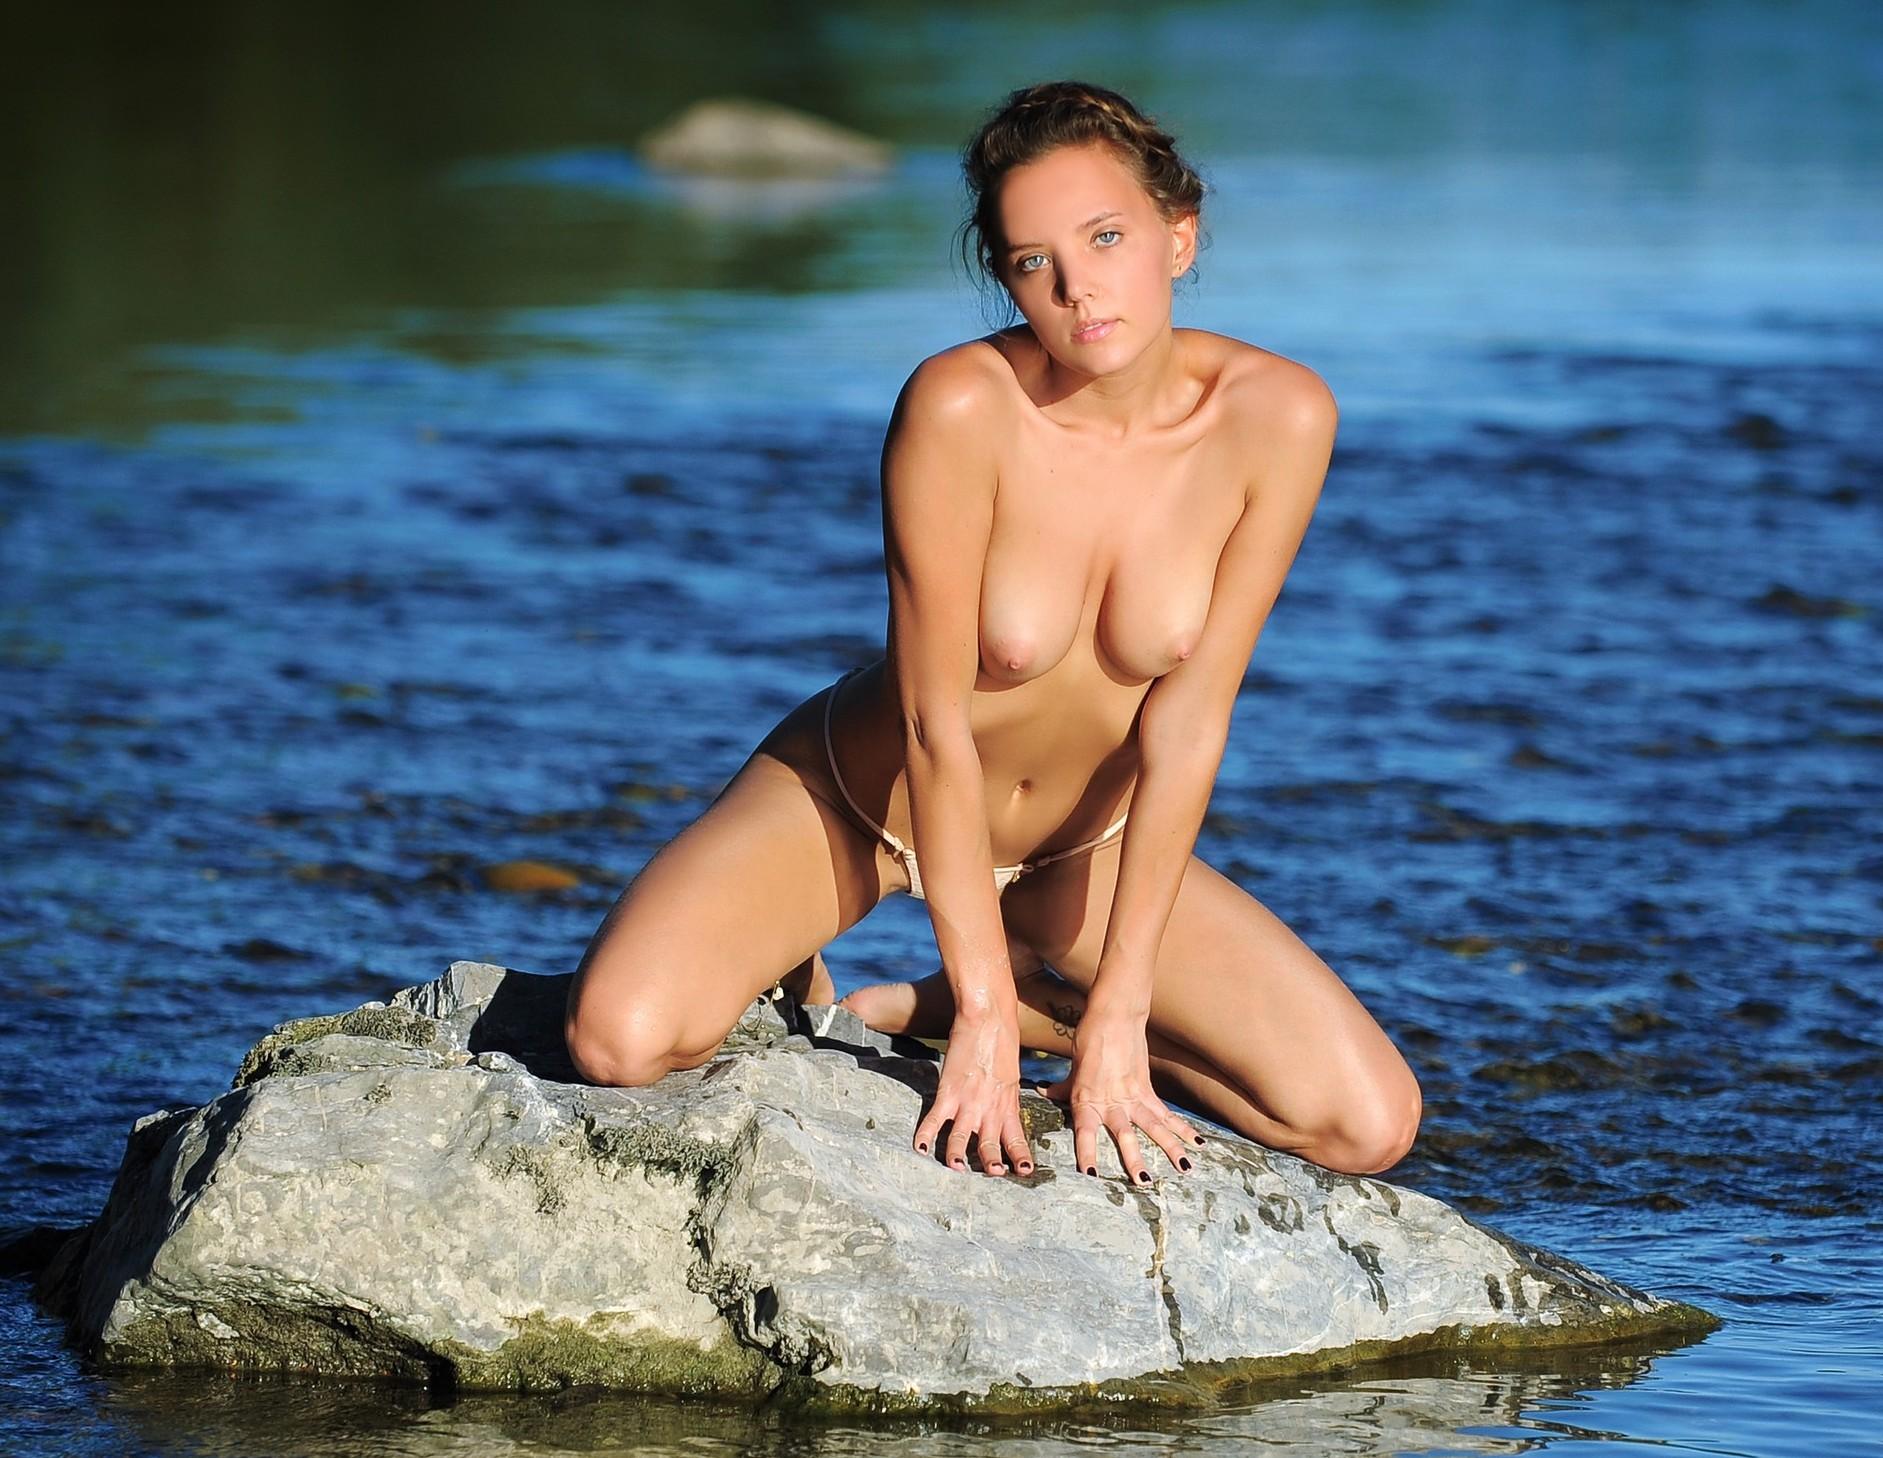 Katya Clover by Artofdan